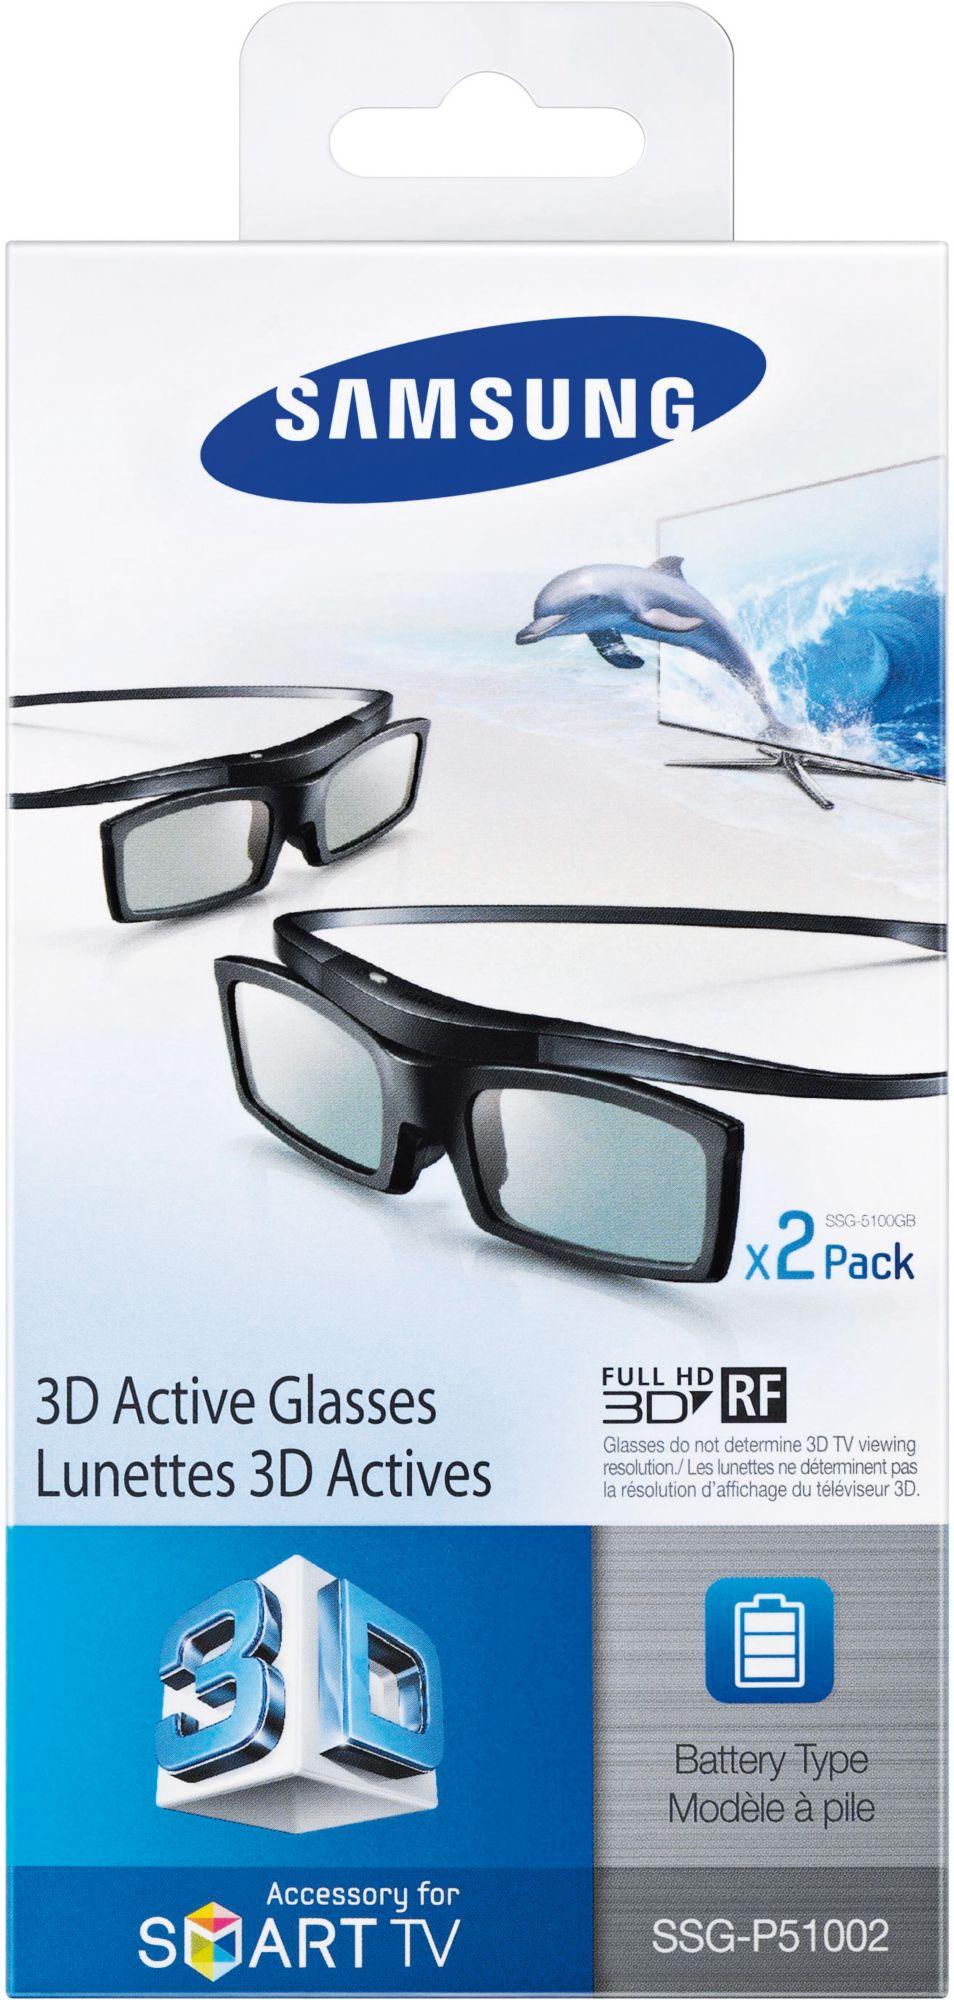 Samsung SSG-P51002 XC 3D-Active-Shutter-Brille 2 Stck.